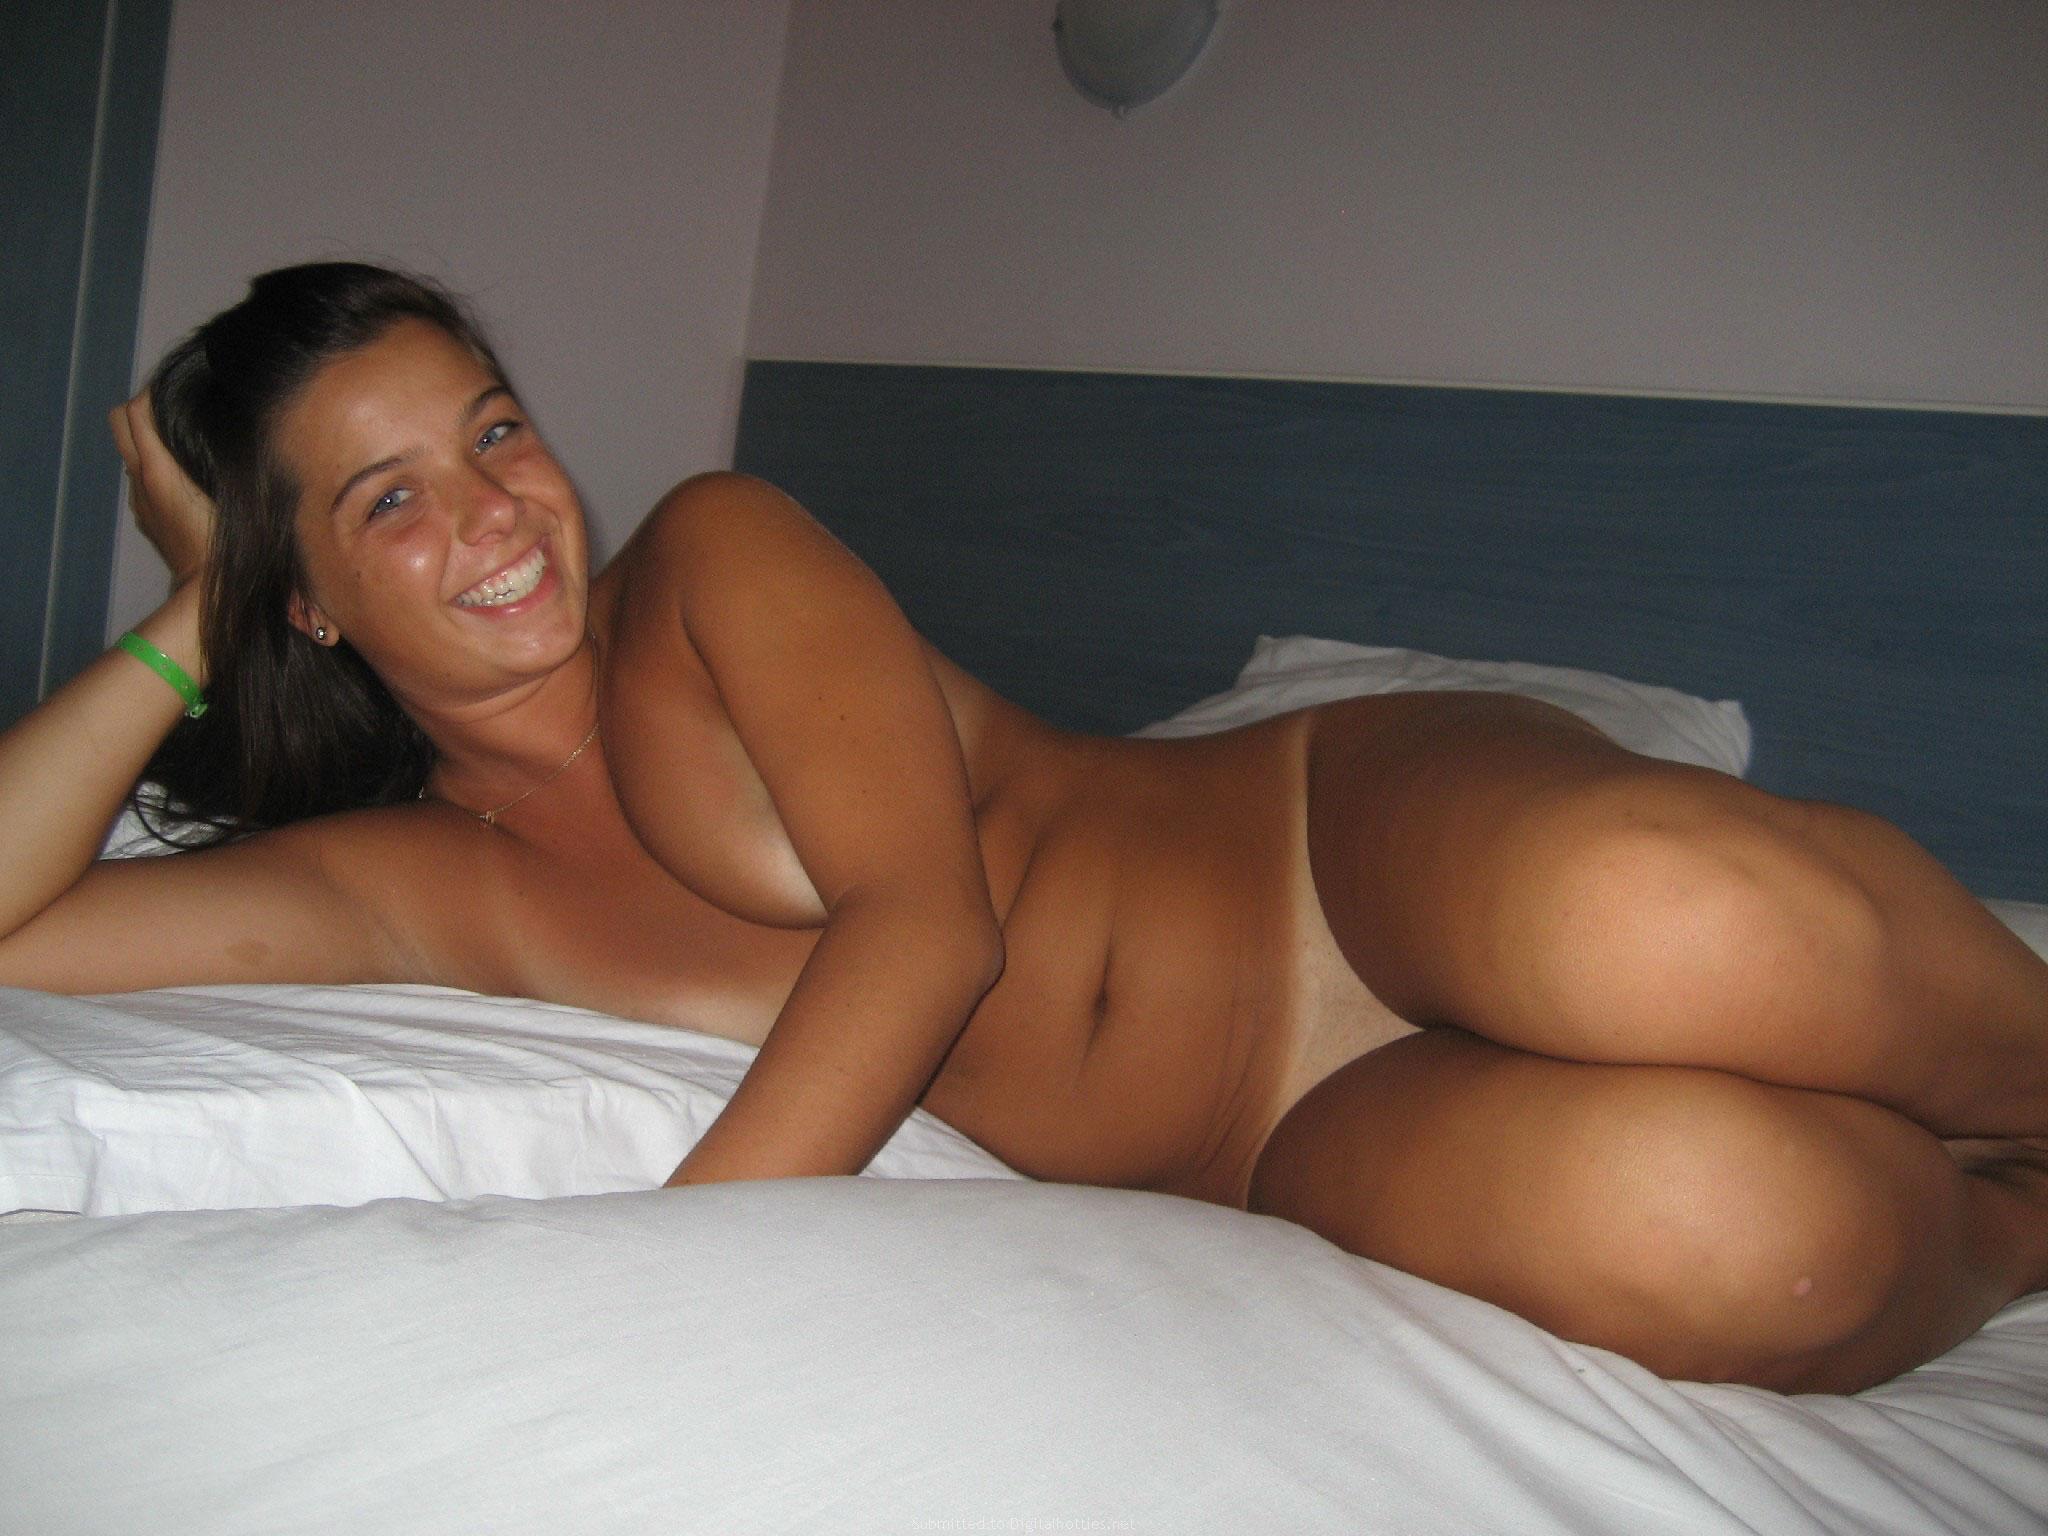 imagenes de mujeres desnudas asiendo sexo